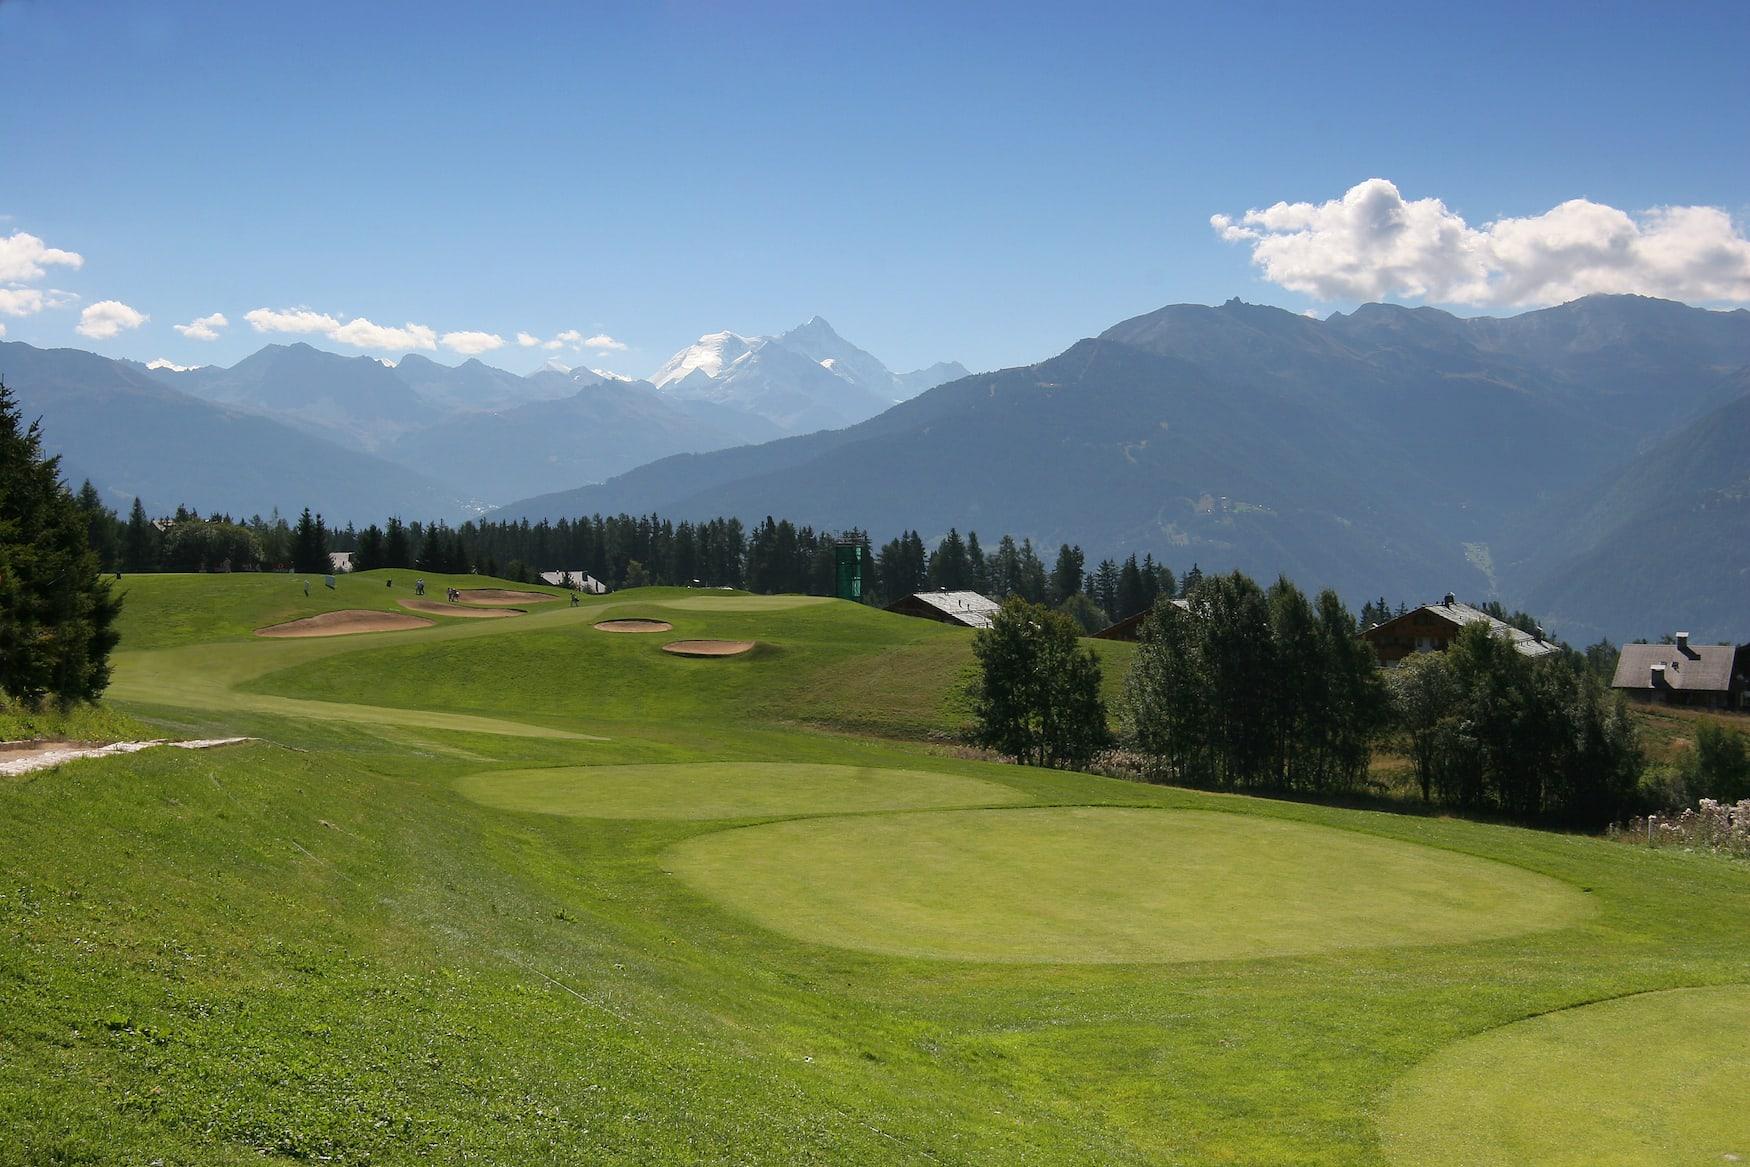 Golfplatz in Crans-Montana